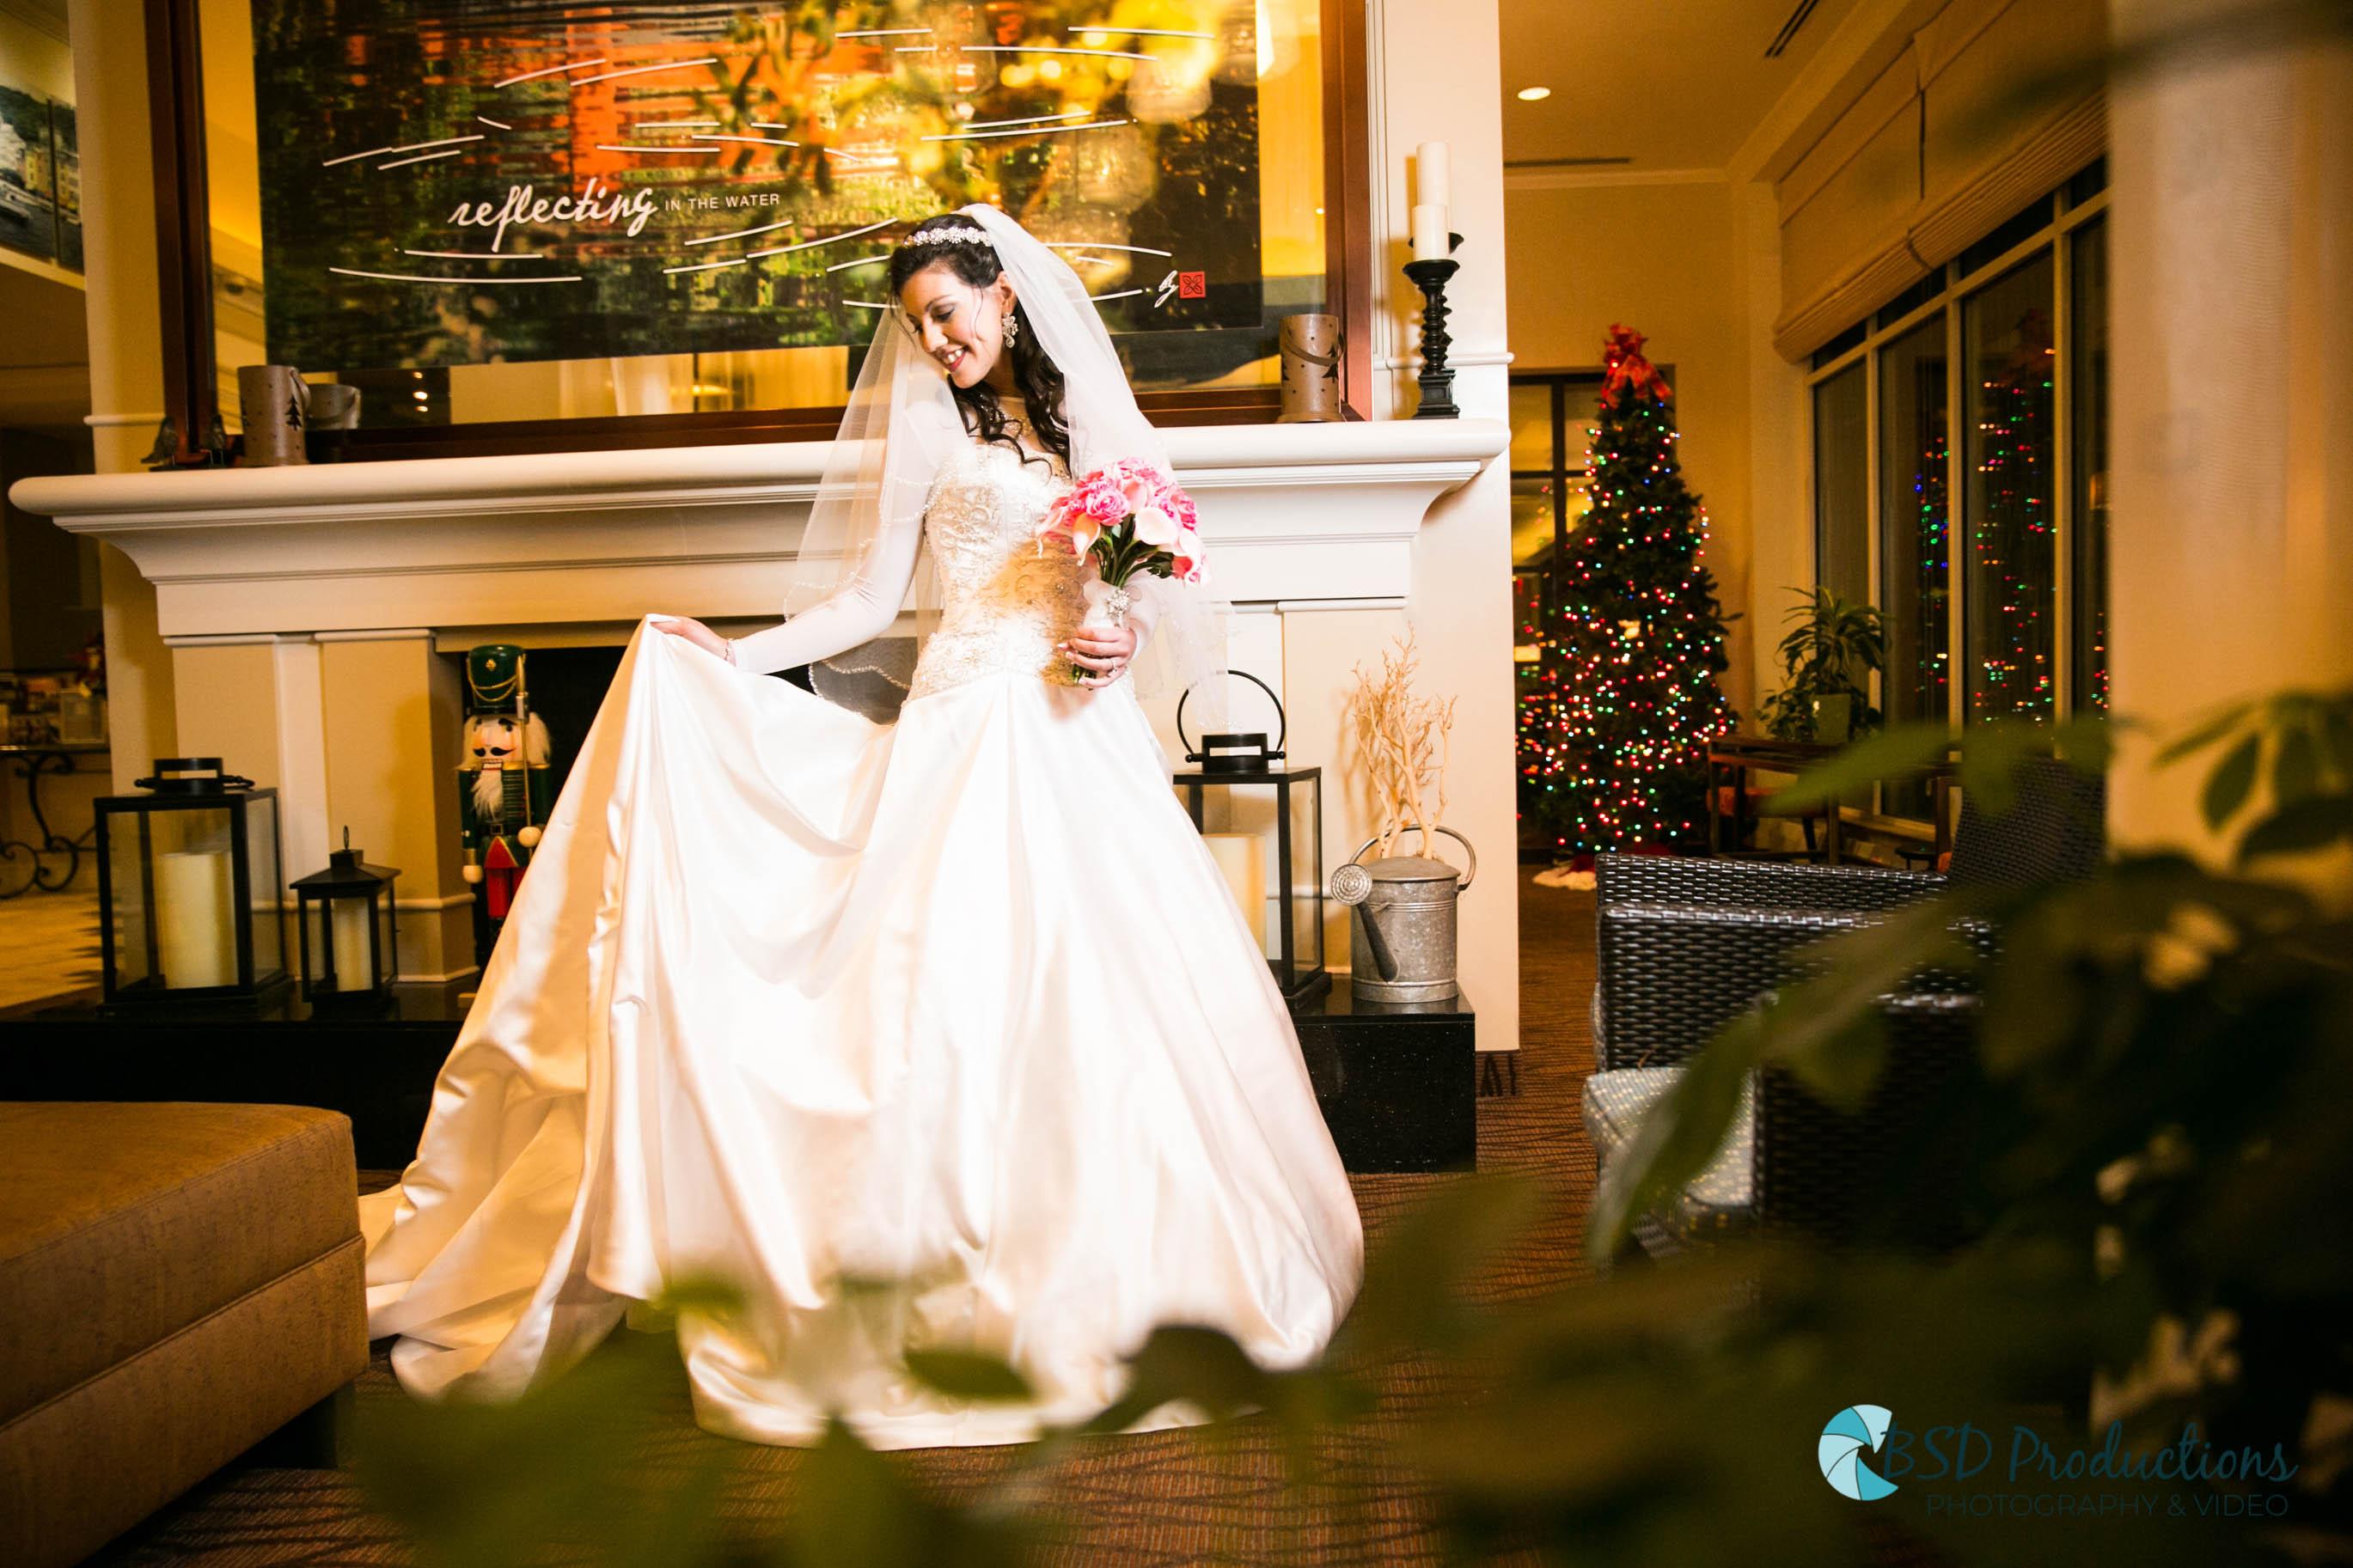 D_R_9928 Wedding – BSD Productions Photography